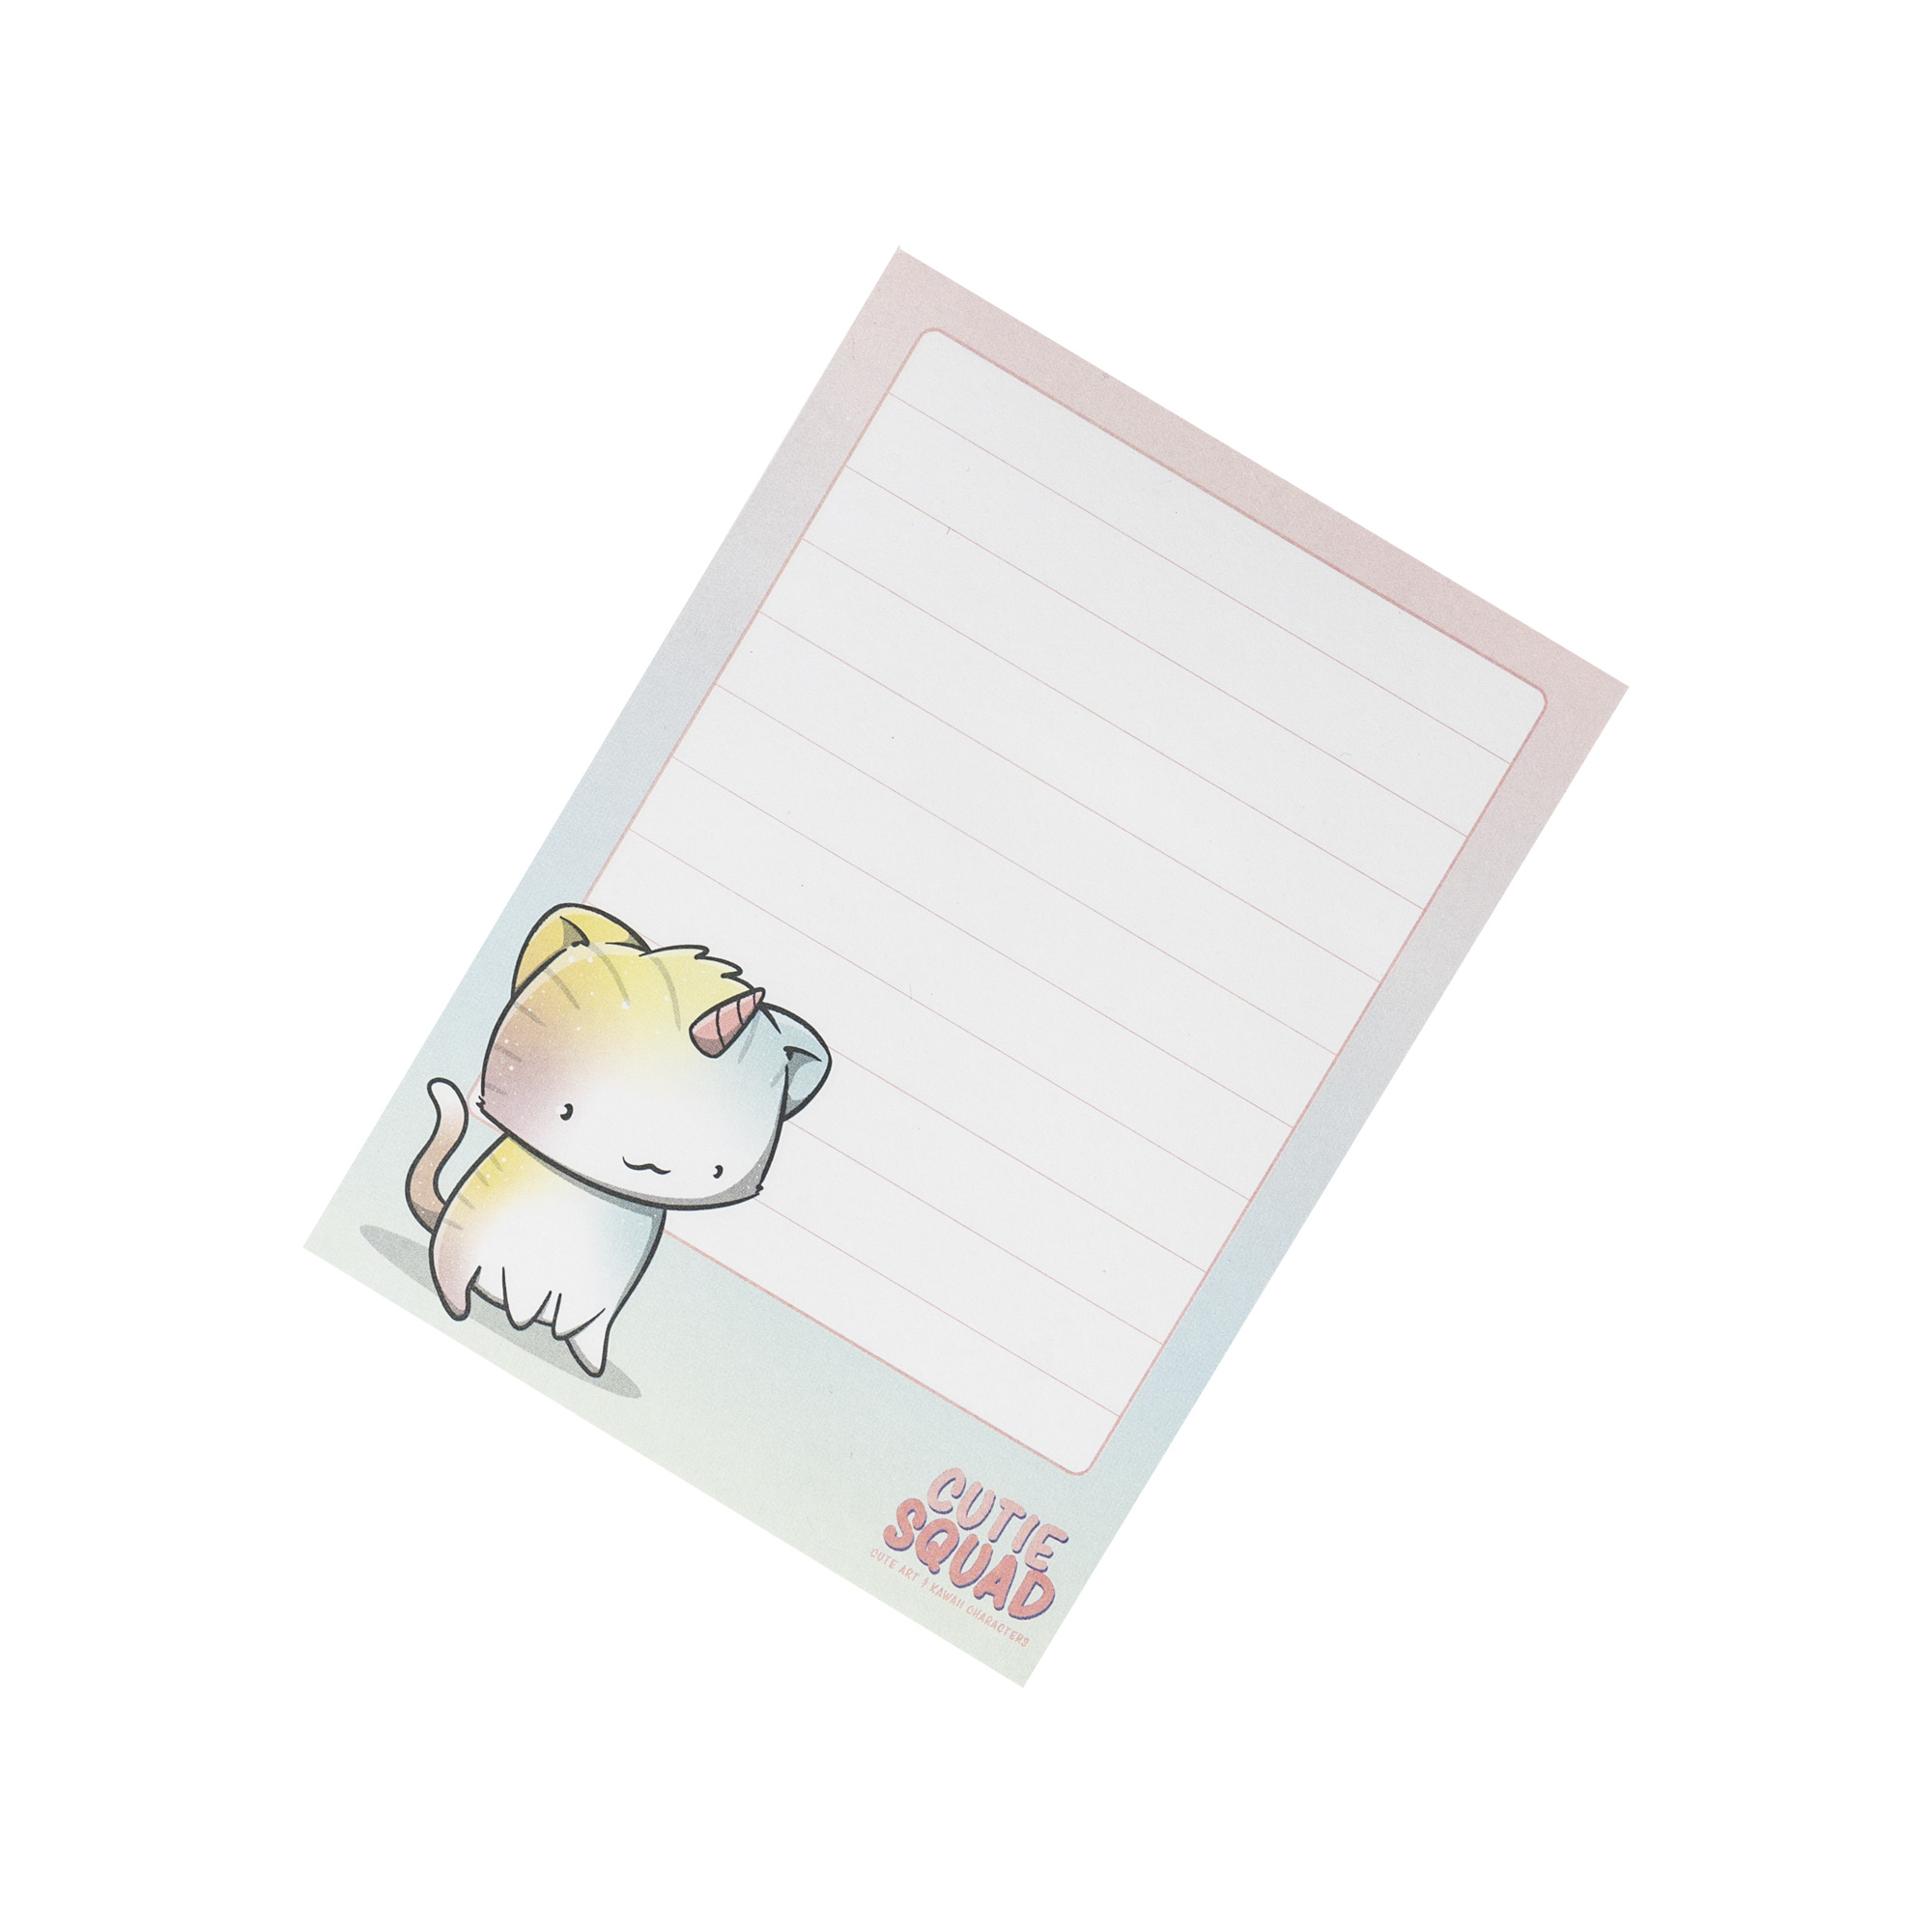 CutieSquad Sticky Notes - Unikitties Single